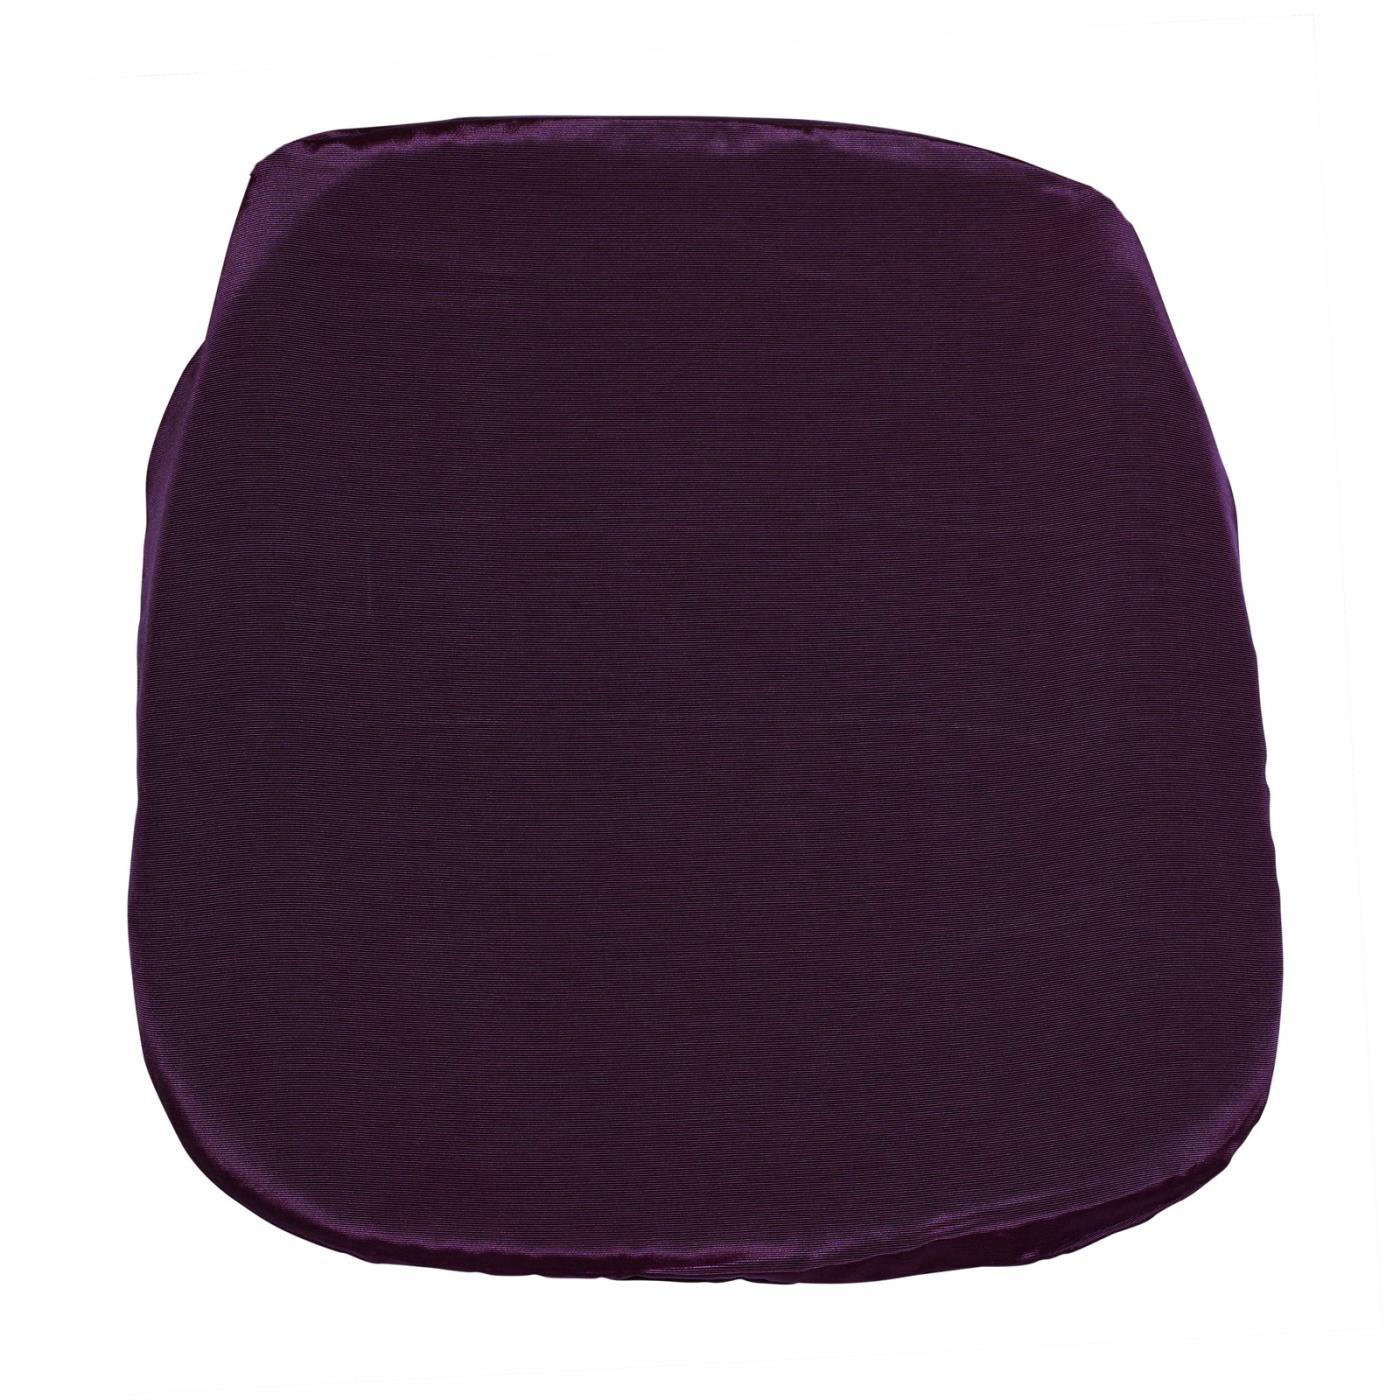 Bengaline Seat Cushion - Amethyst